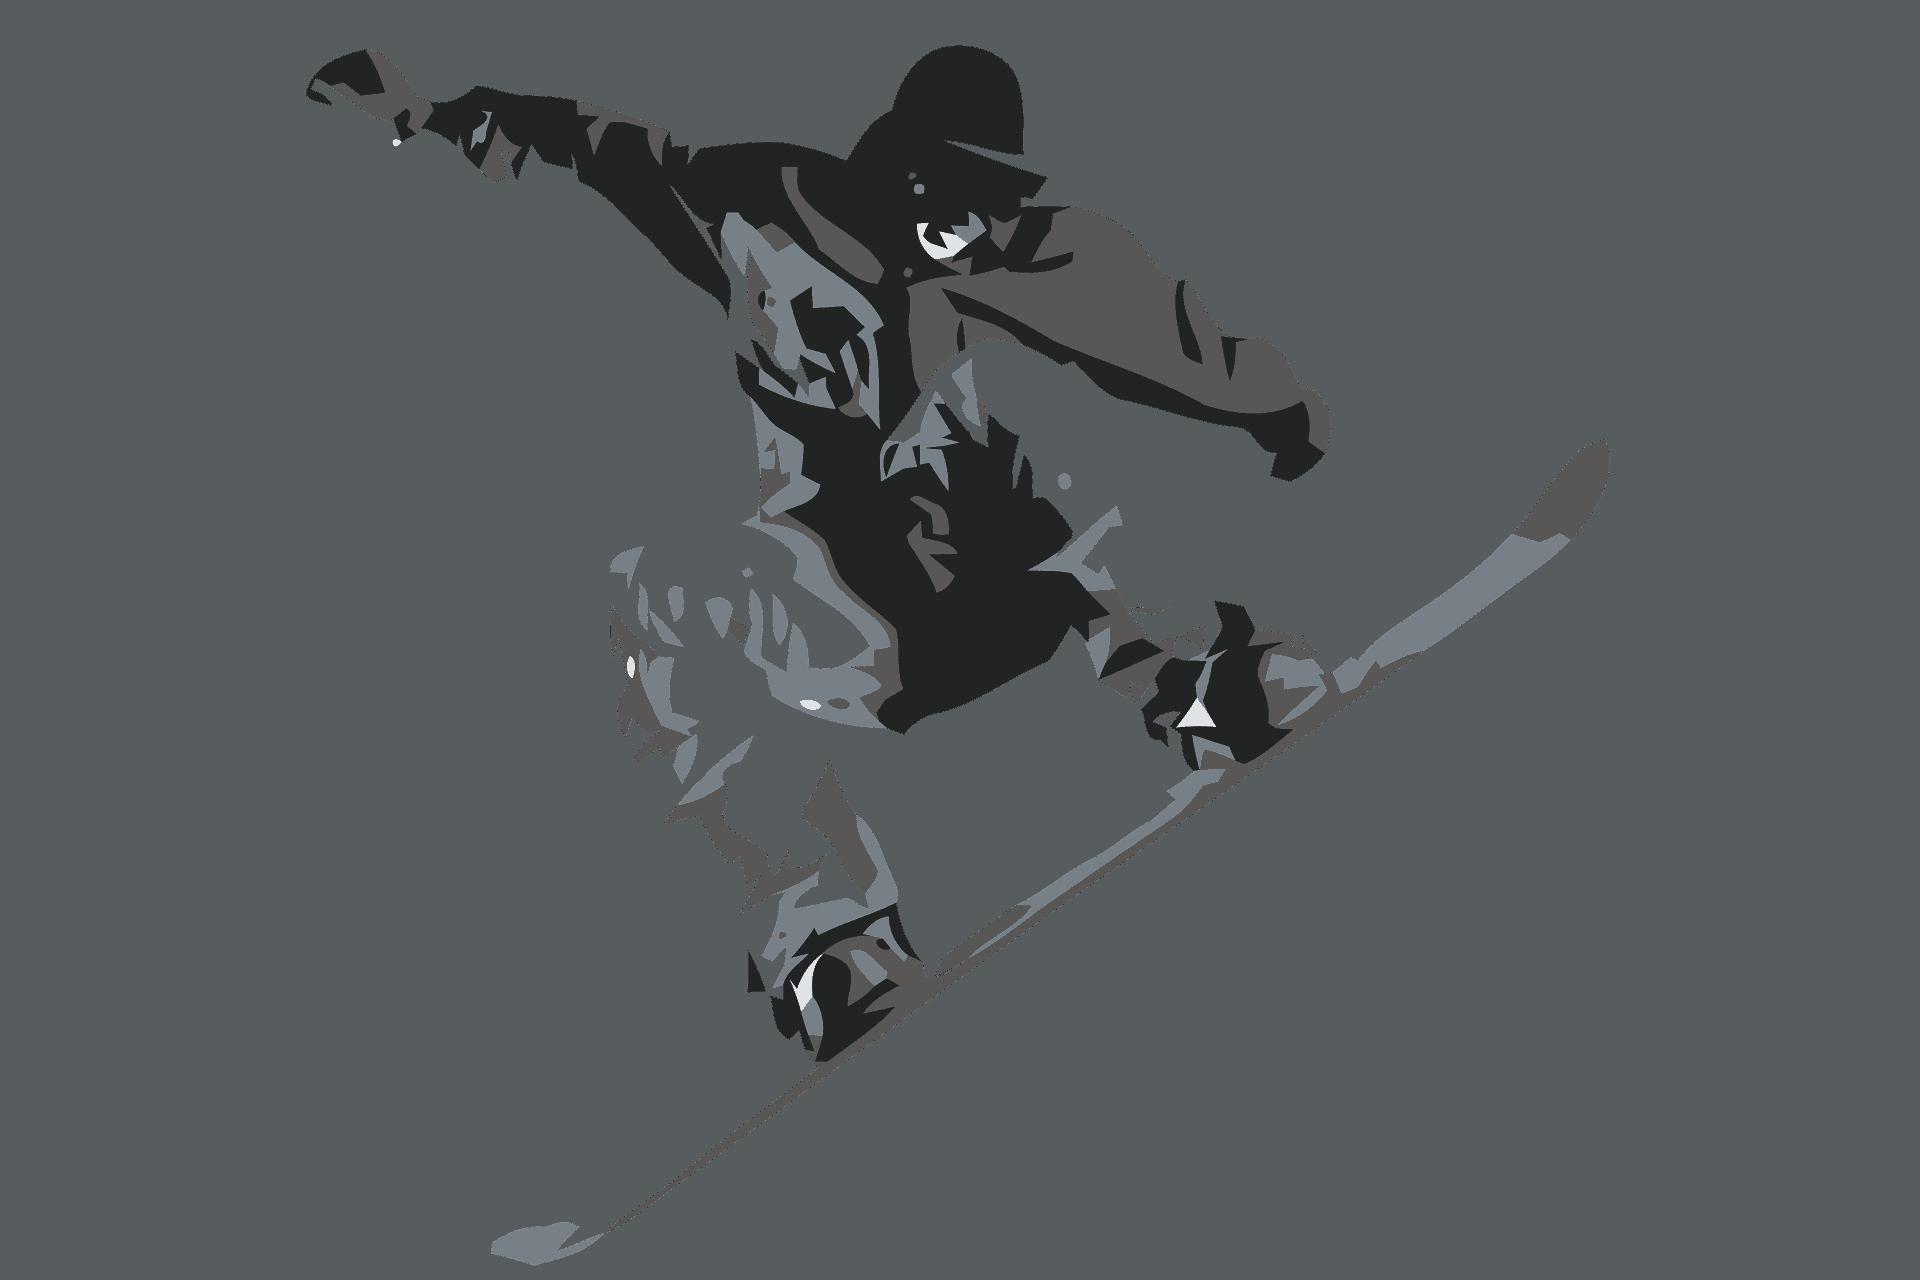 snow-boarder-1335696_1920